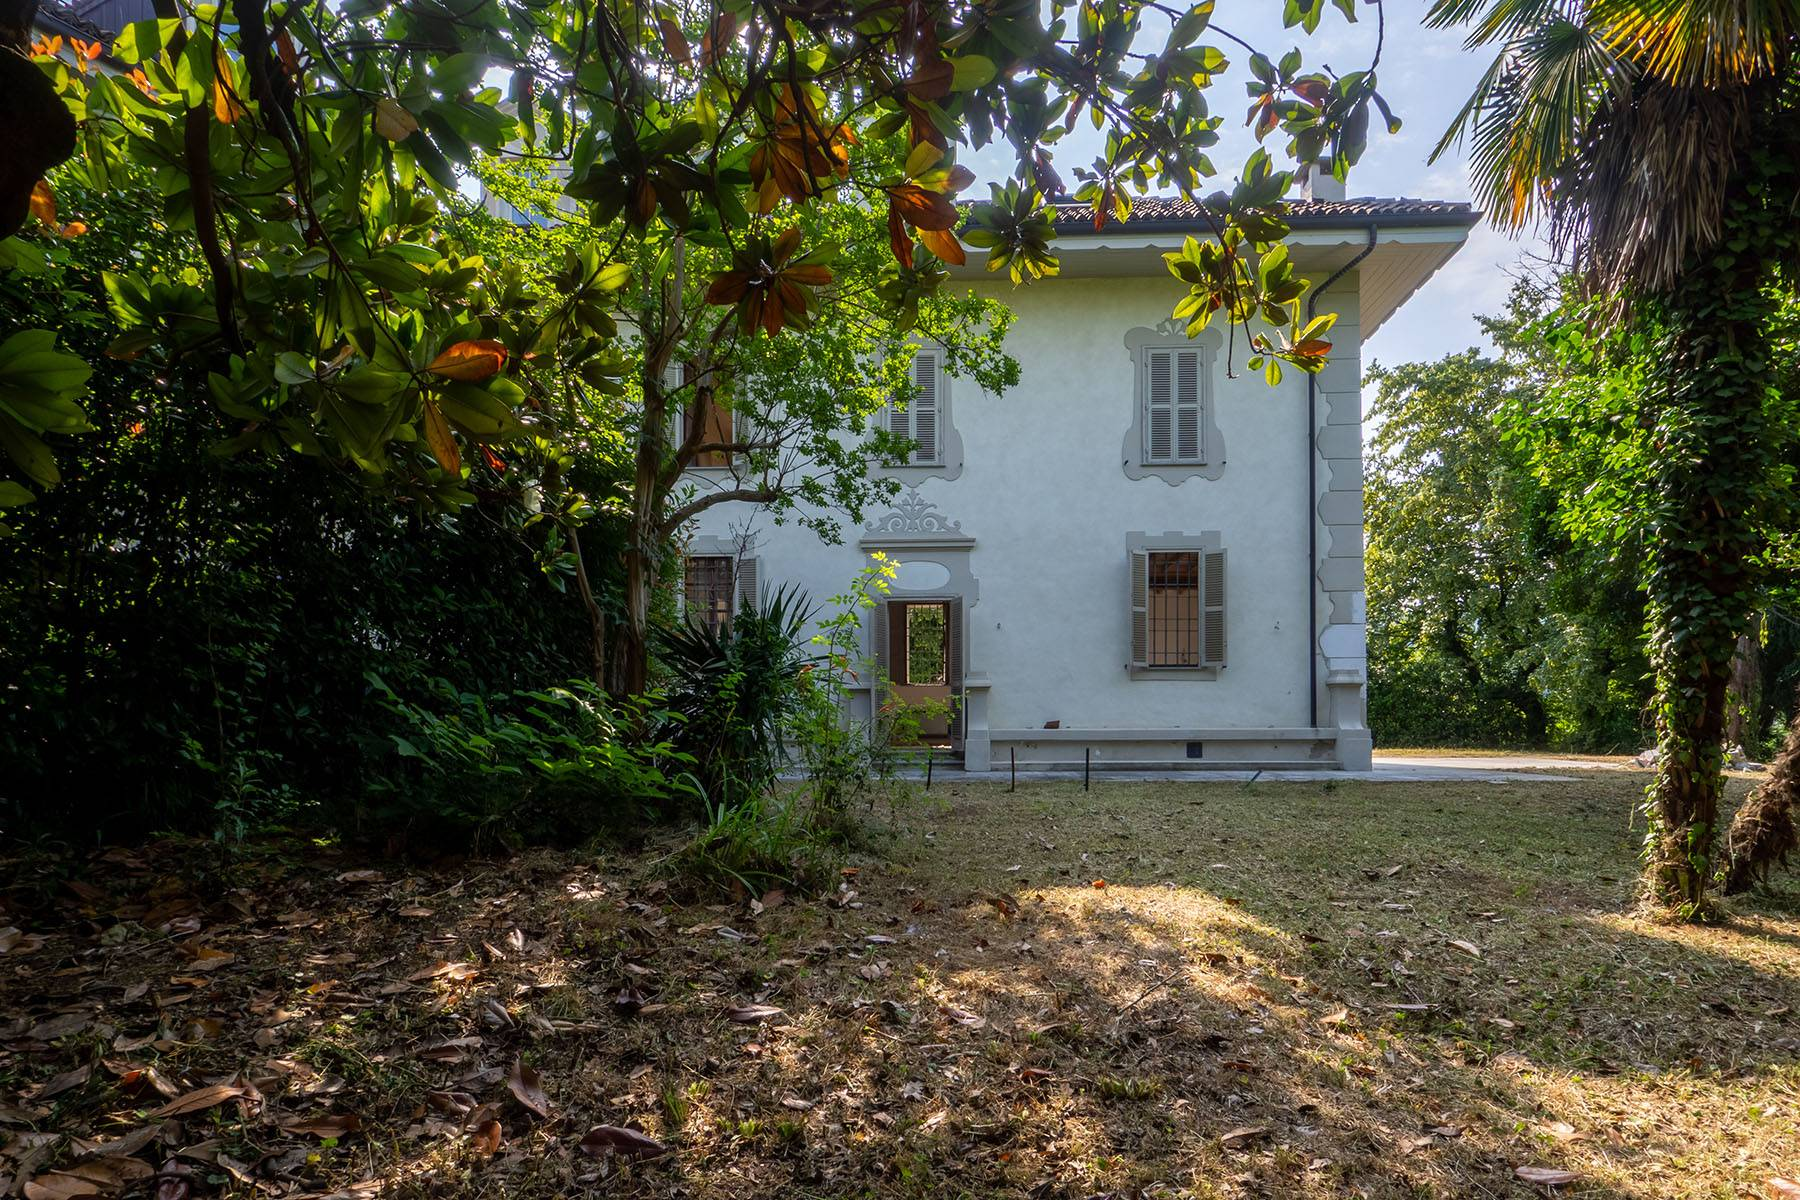 Casa indipendente in Vendita a Torino: 5 locali, 400 mq - Foto 3